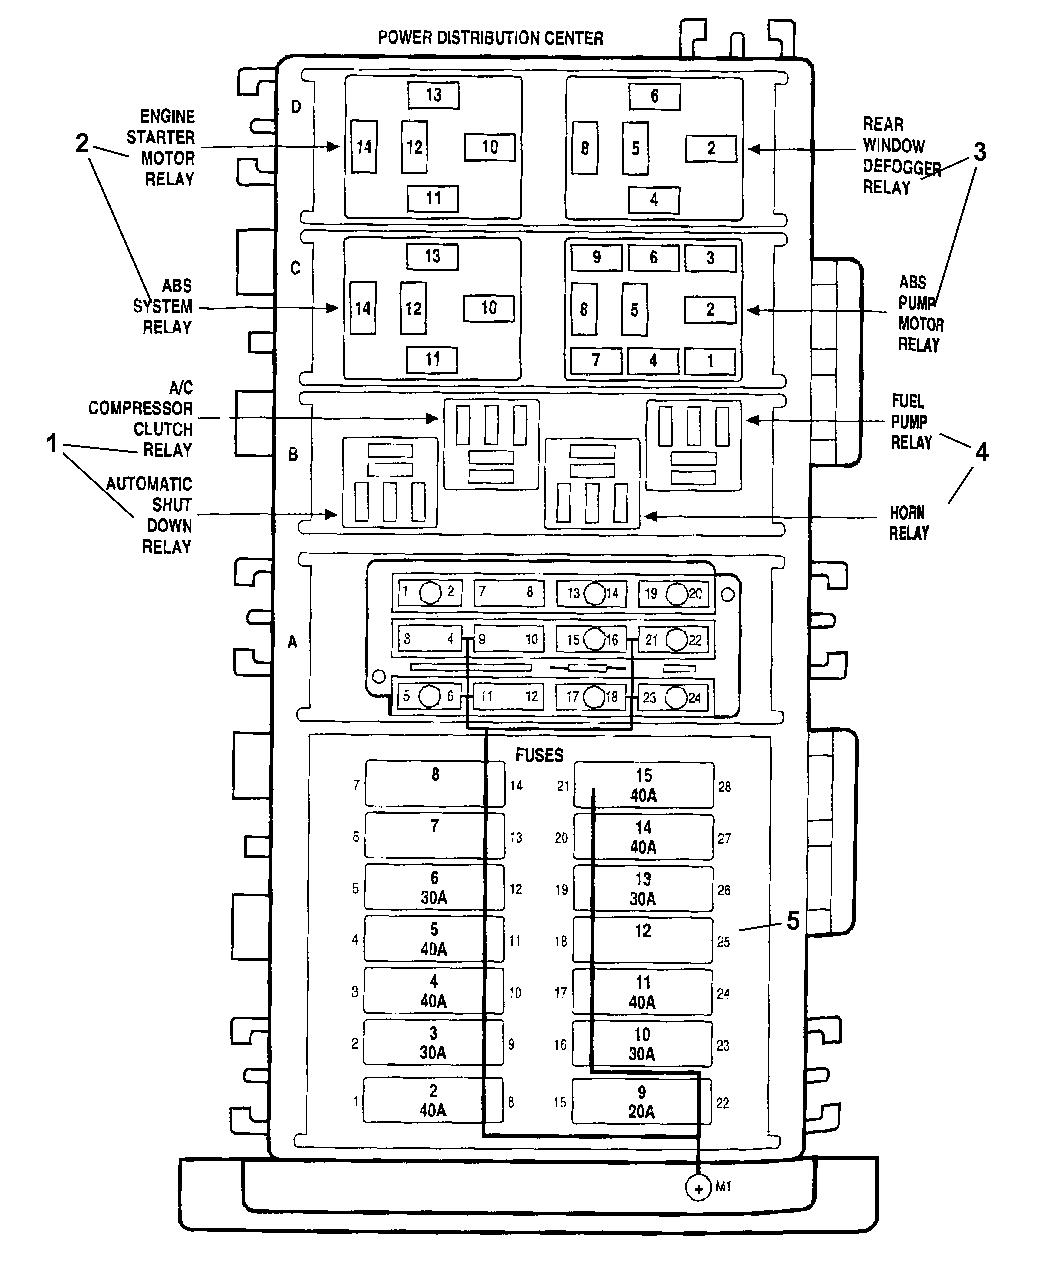 1999 jeep wrangler power distribution center relays fuses rh moparpartsgiant com 1999 jeep wrangler radio wiring diagram 1999 jeep wrangler radio wiring diagram